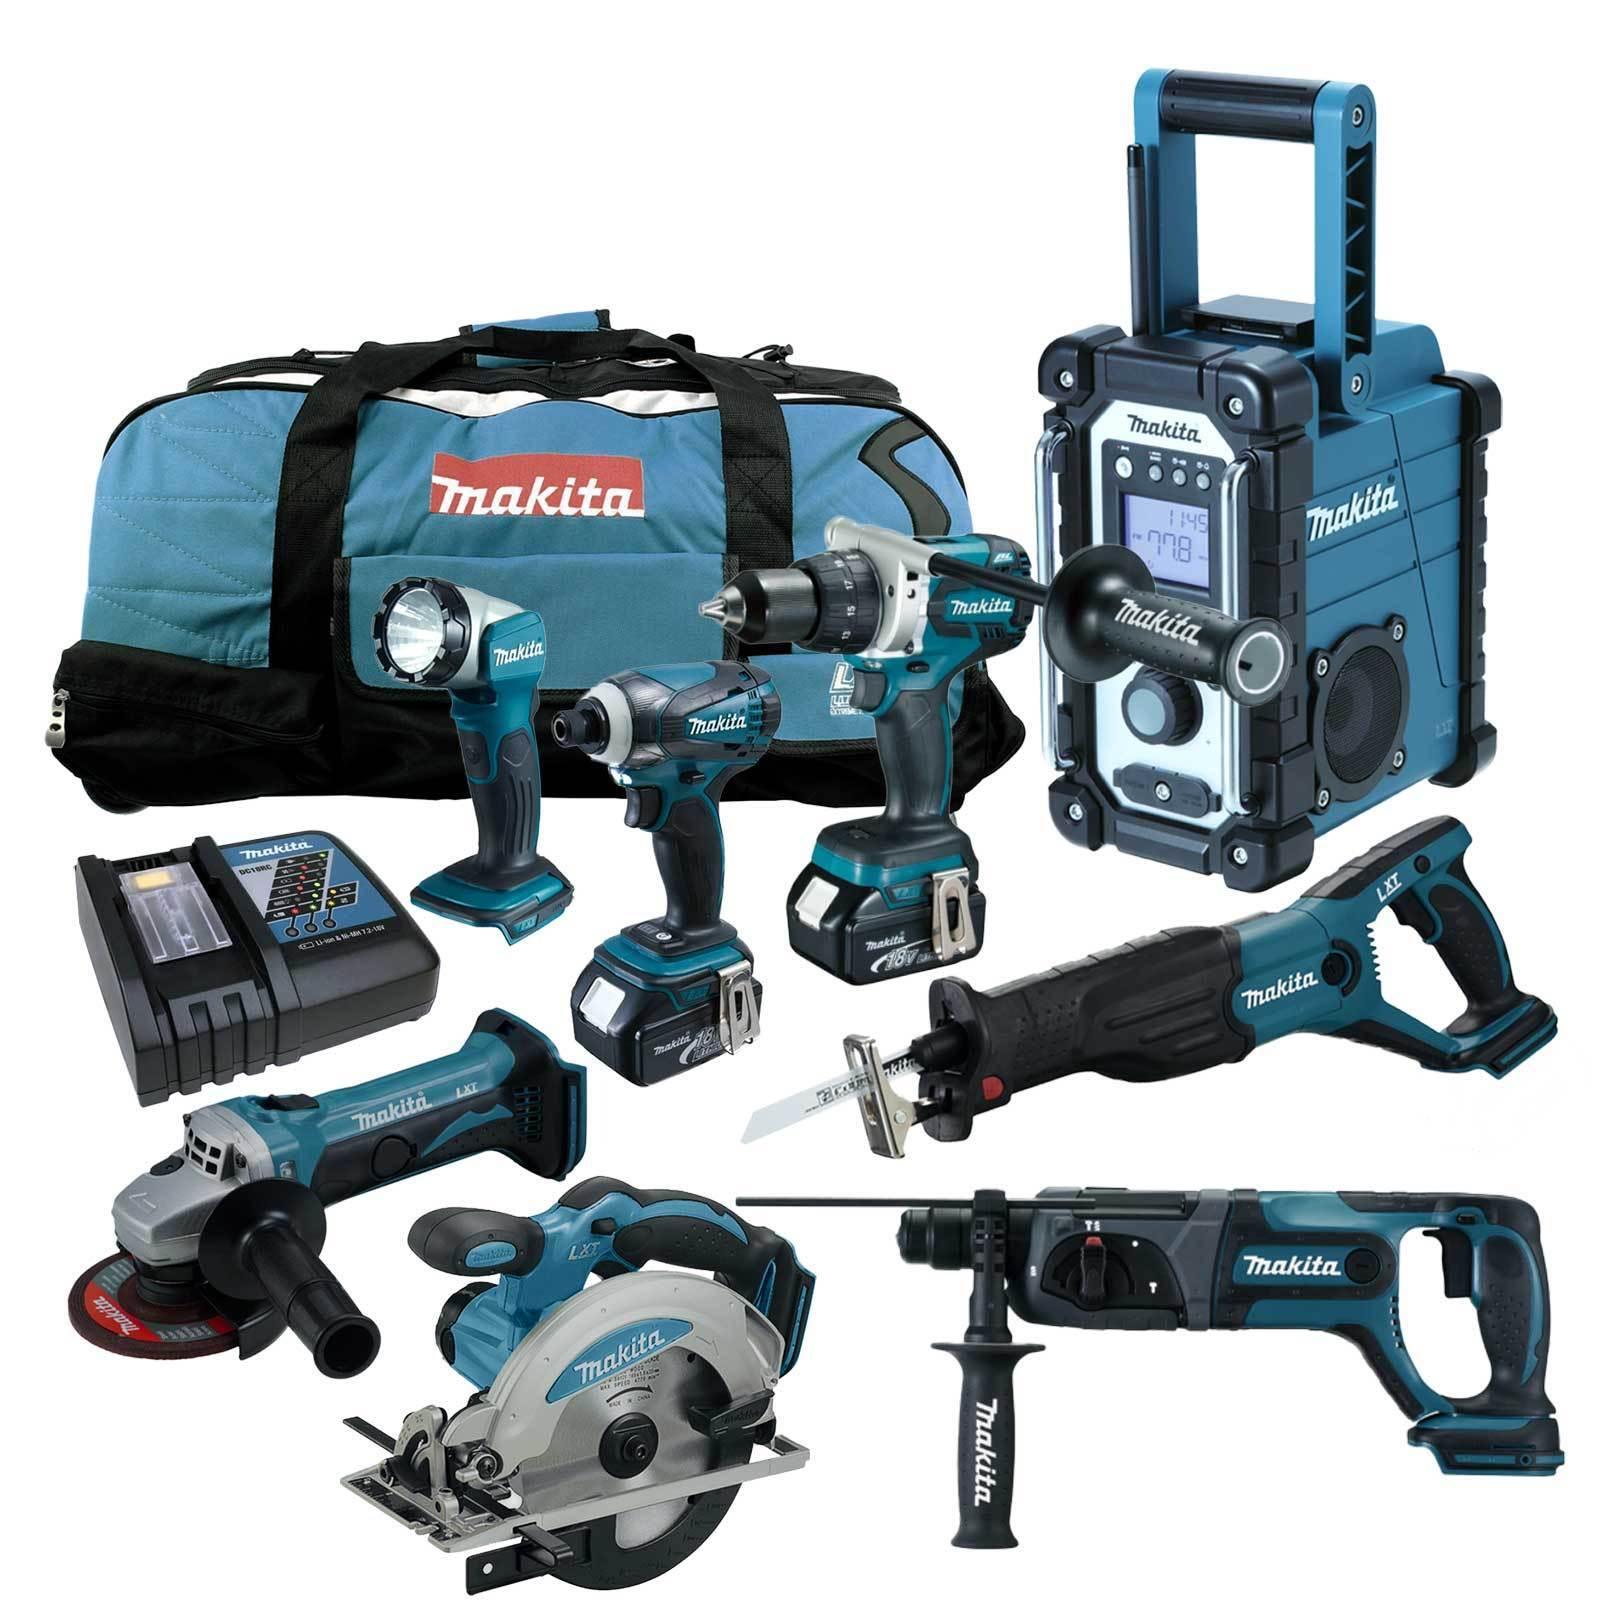 MAKITA LXT 18V 12tlg. Akku Werkzeug Set +DDF481 Bohrschrauber +DHR241 RMJ RFJ